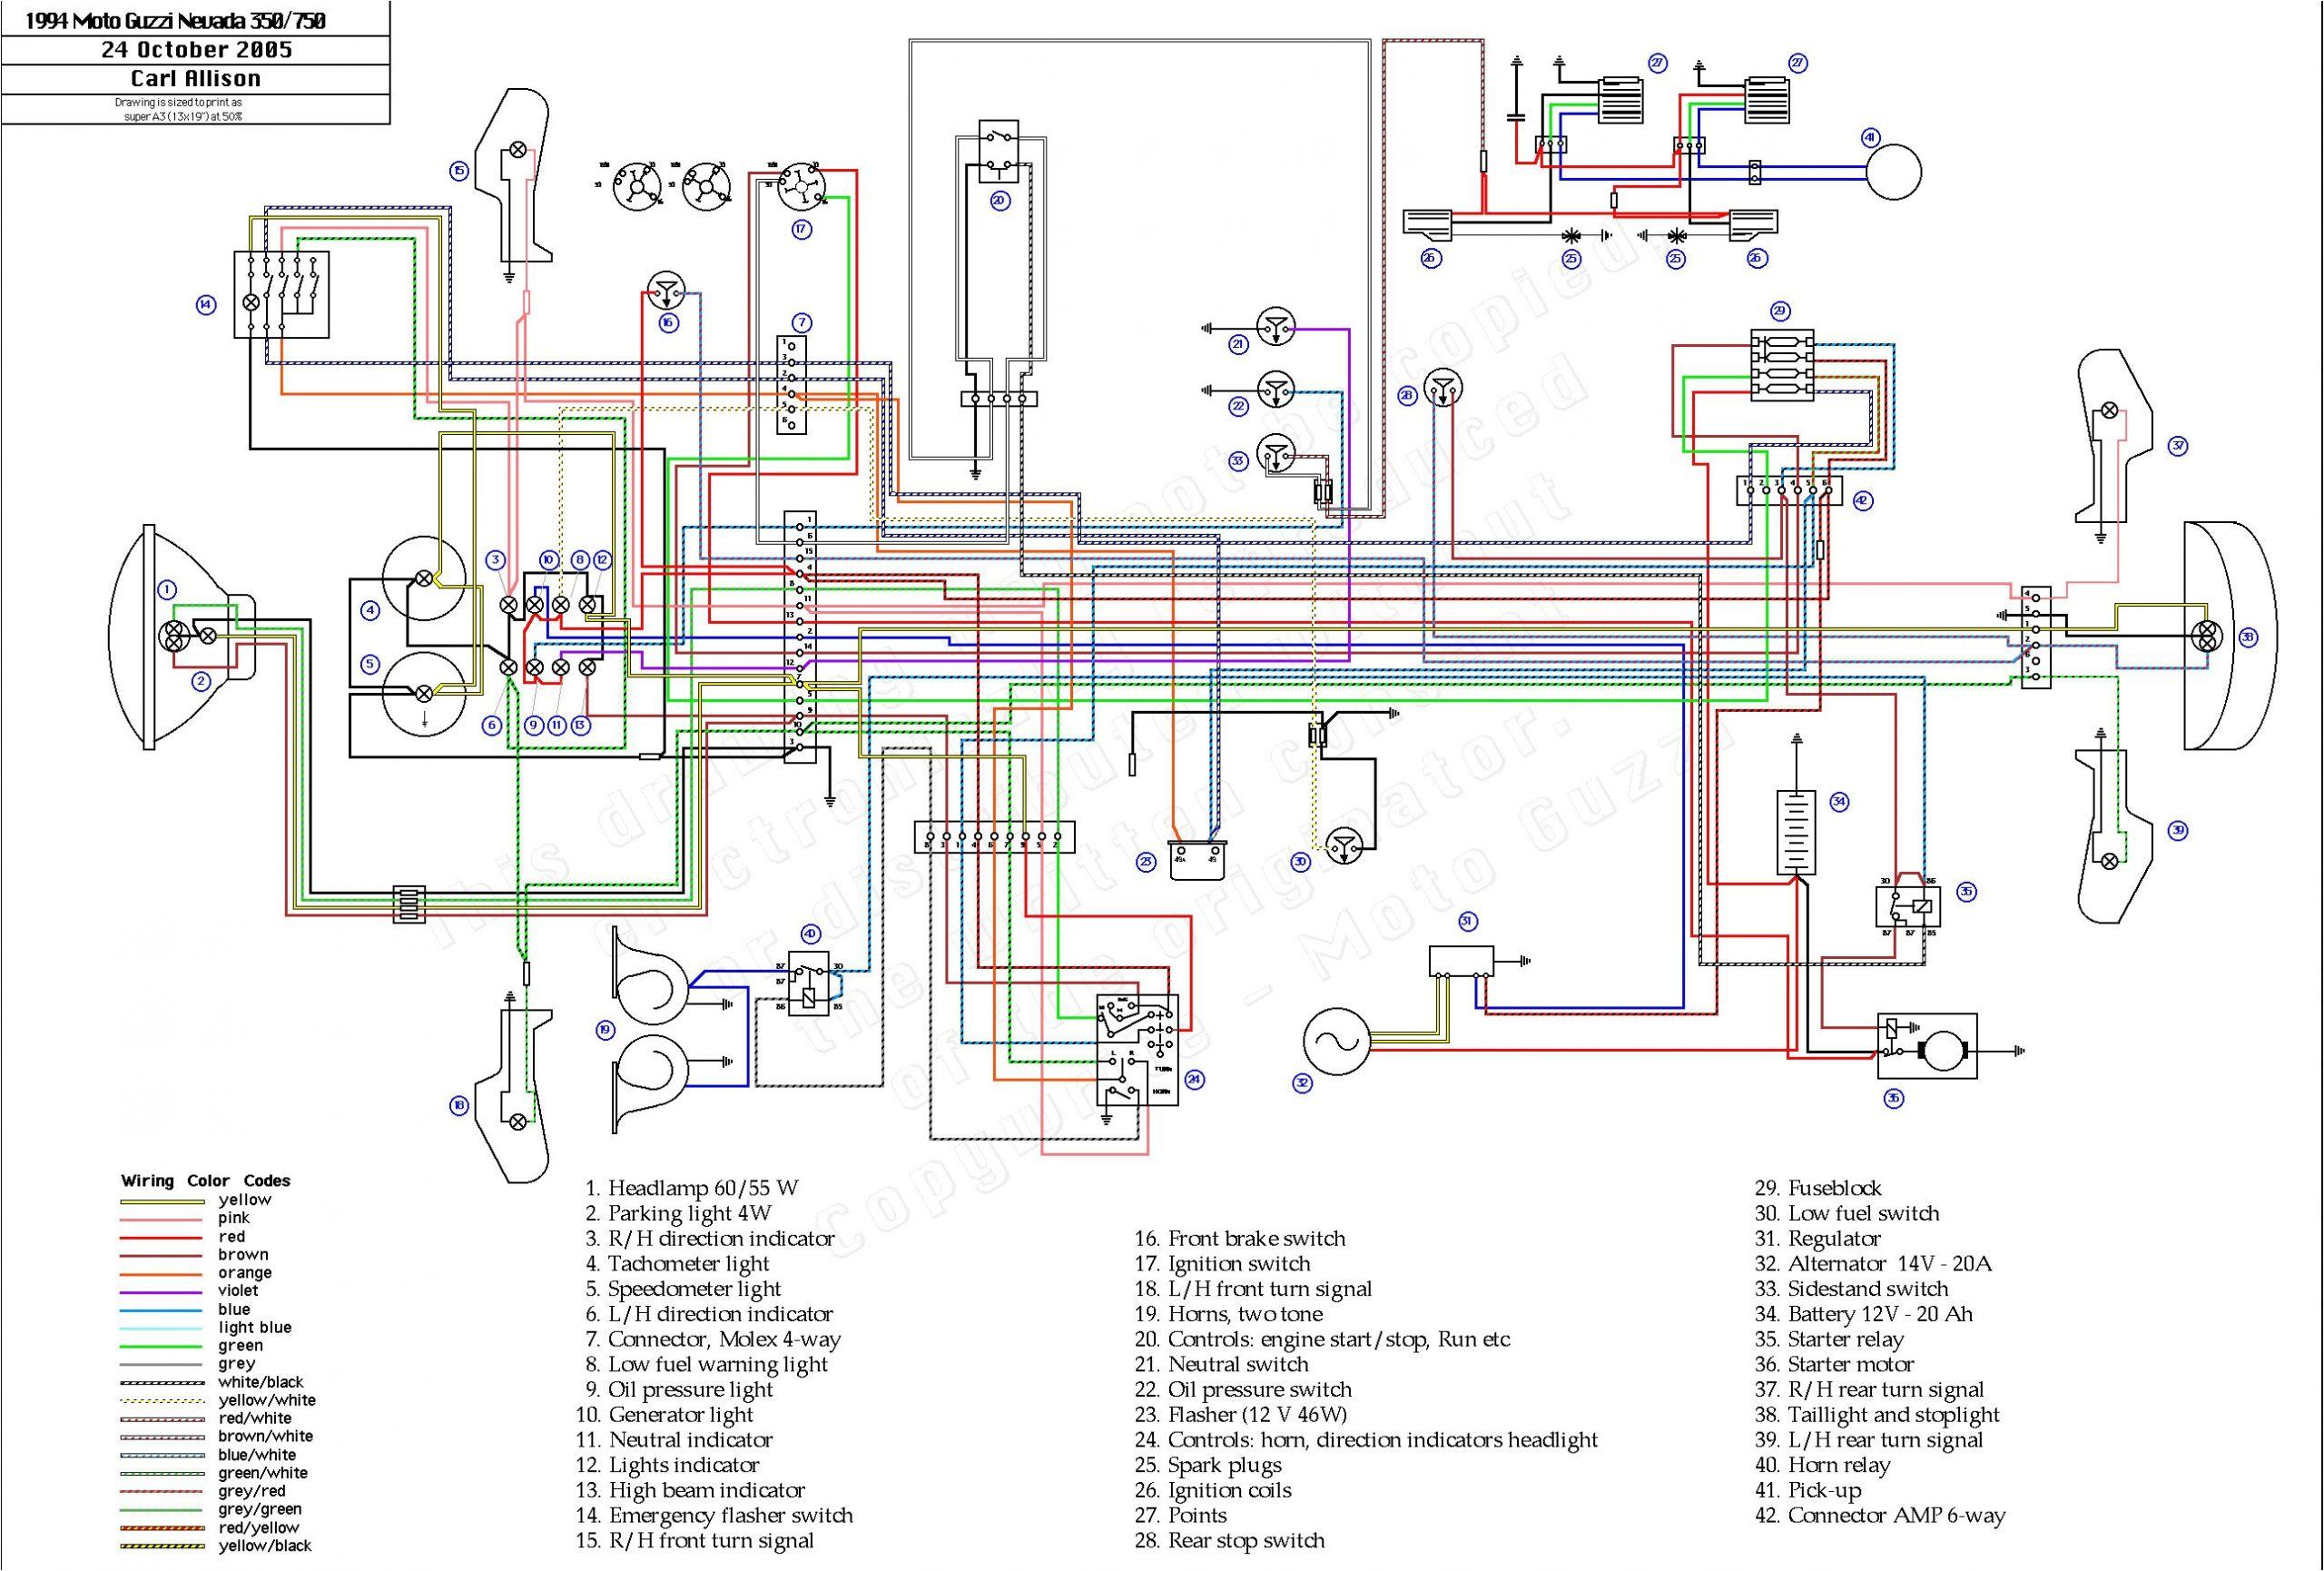 1988 yamaha warrior wiring diagram data incredible 1987 350 with 350 warrior wiring diagram jpg